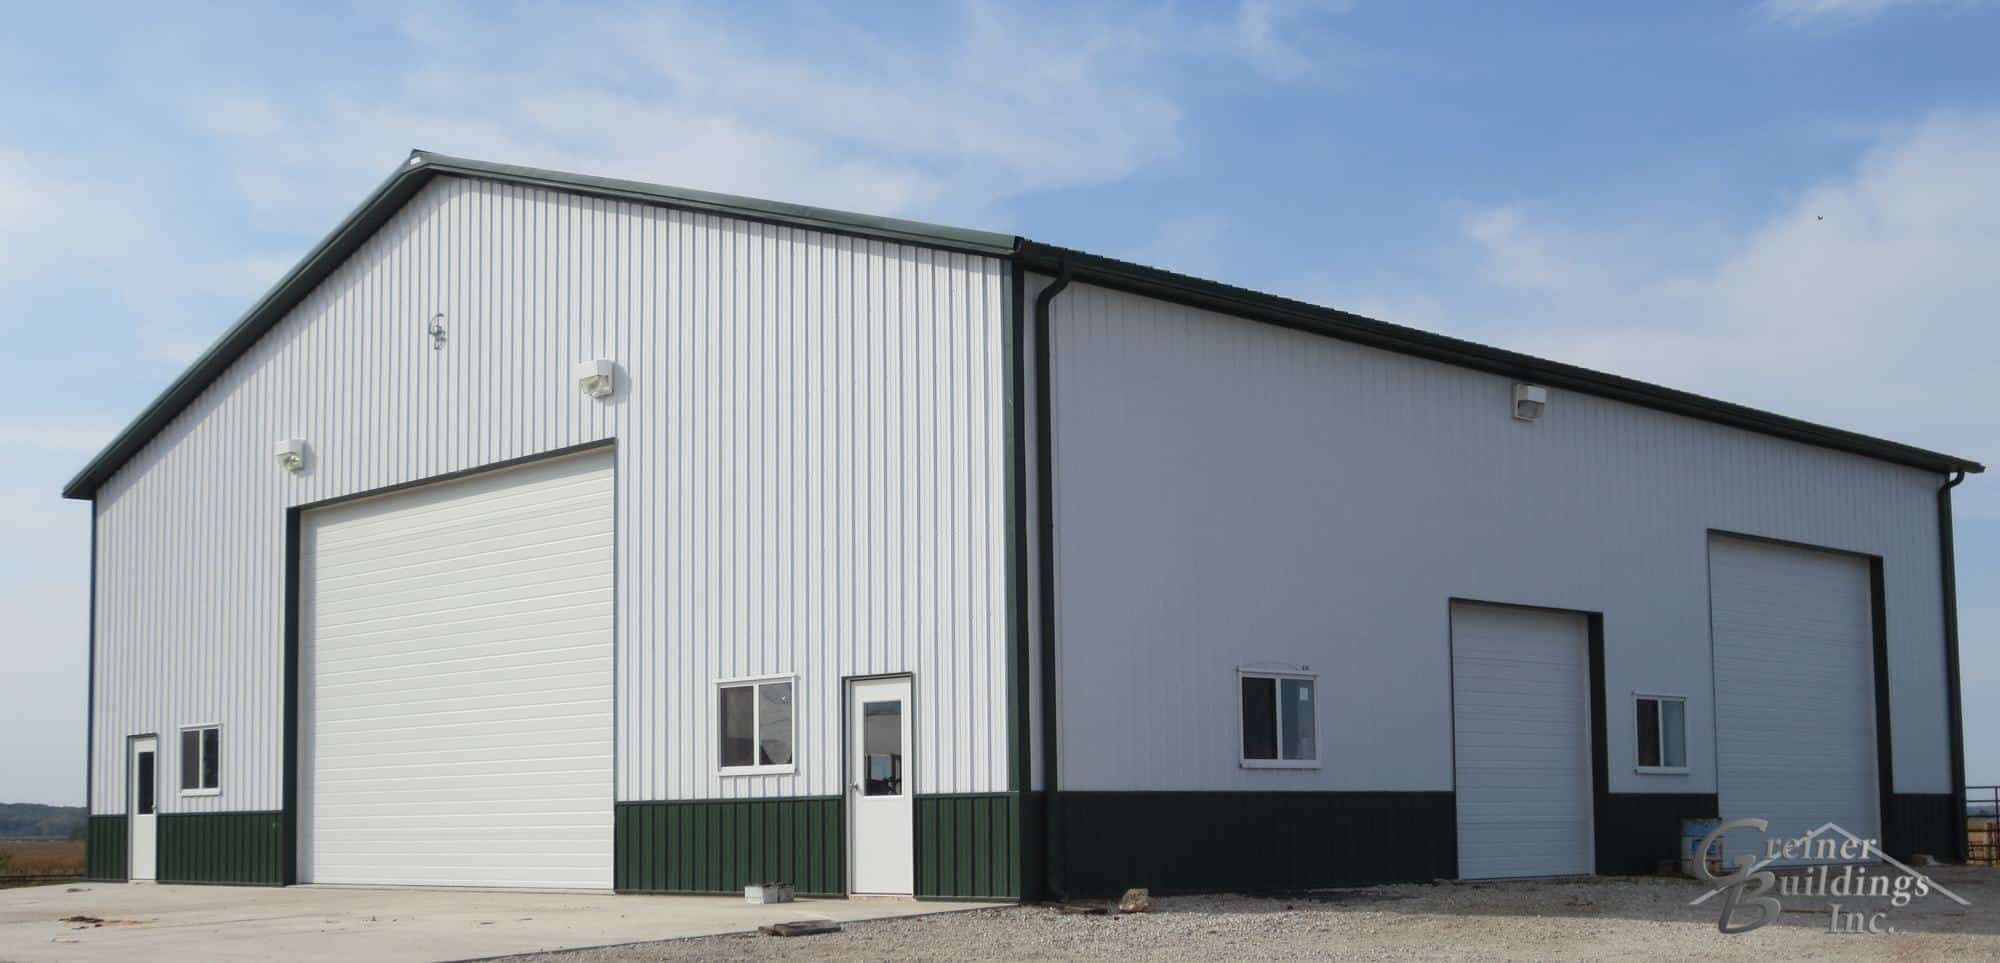 Letts Iowa Pole Barn Buildings Greiner Buildings Inc